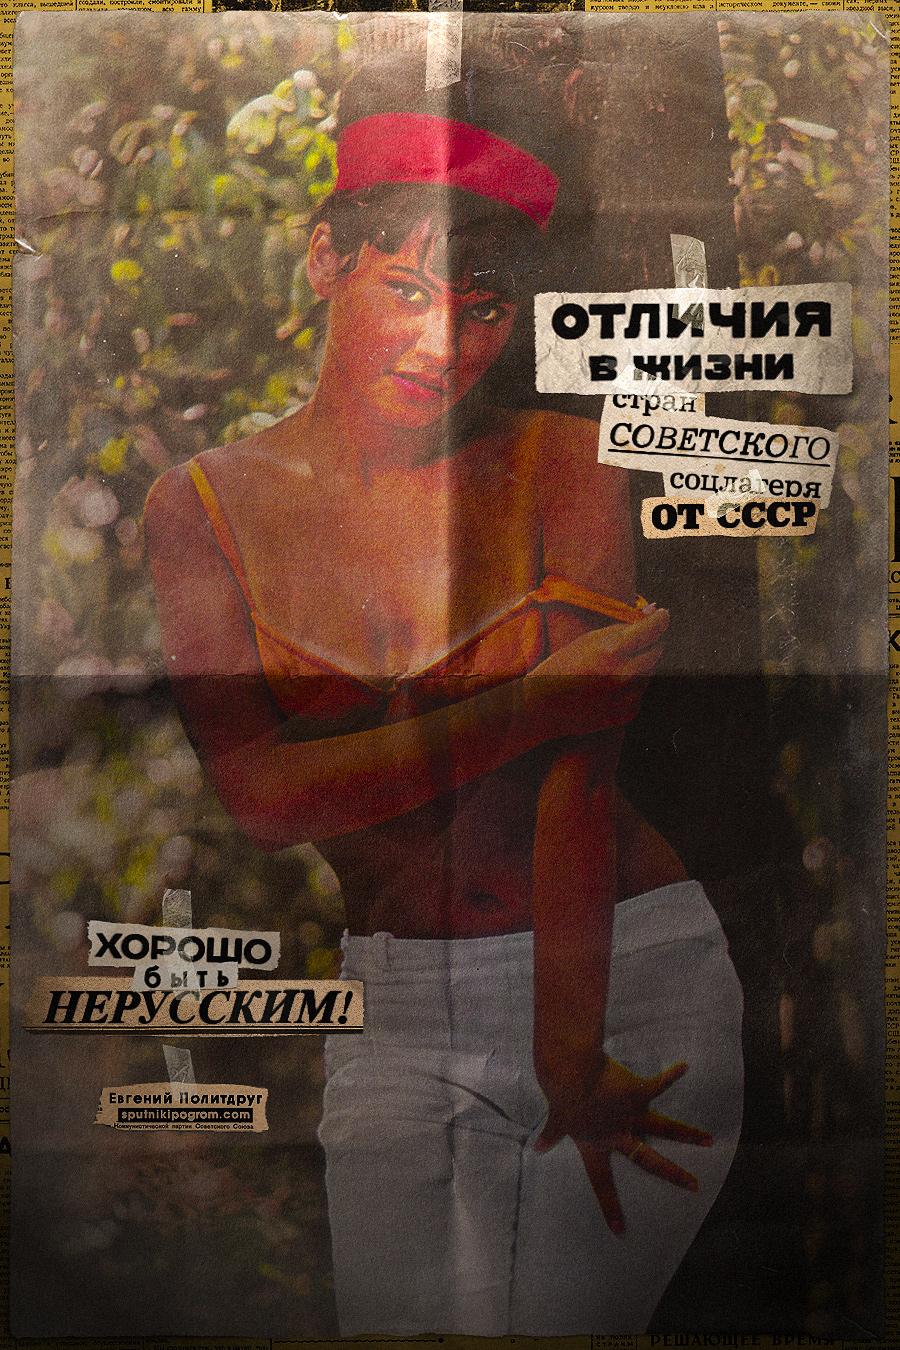 sov-cover